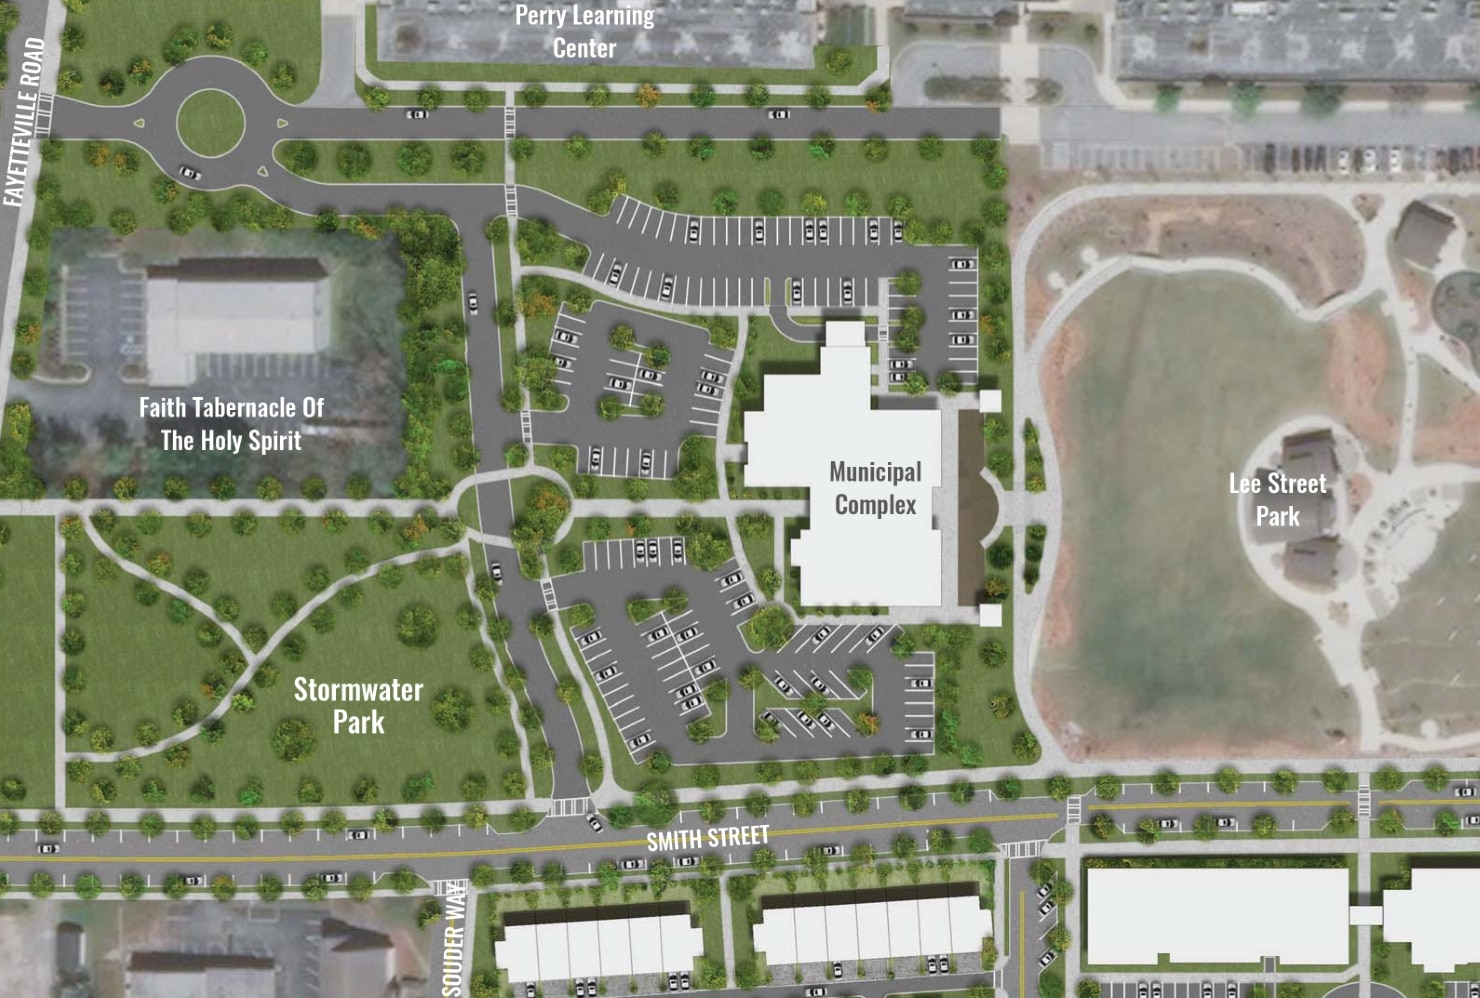 City of Jonesboro Municipal Complex